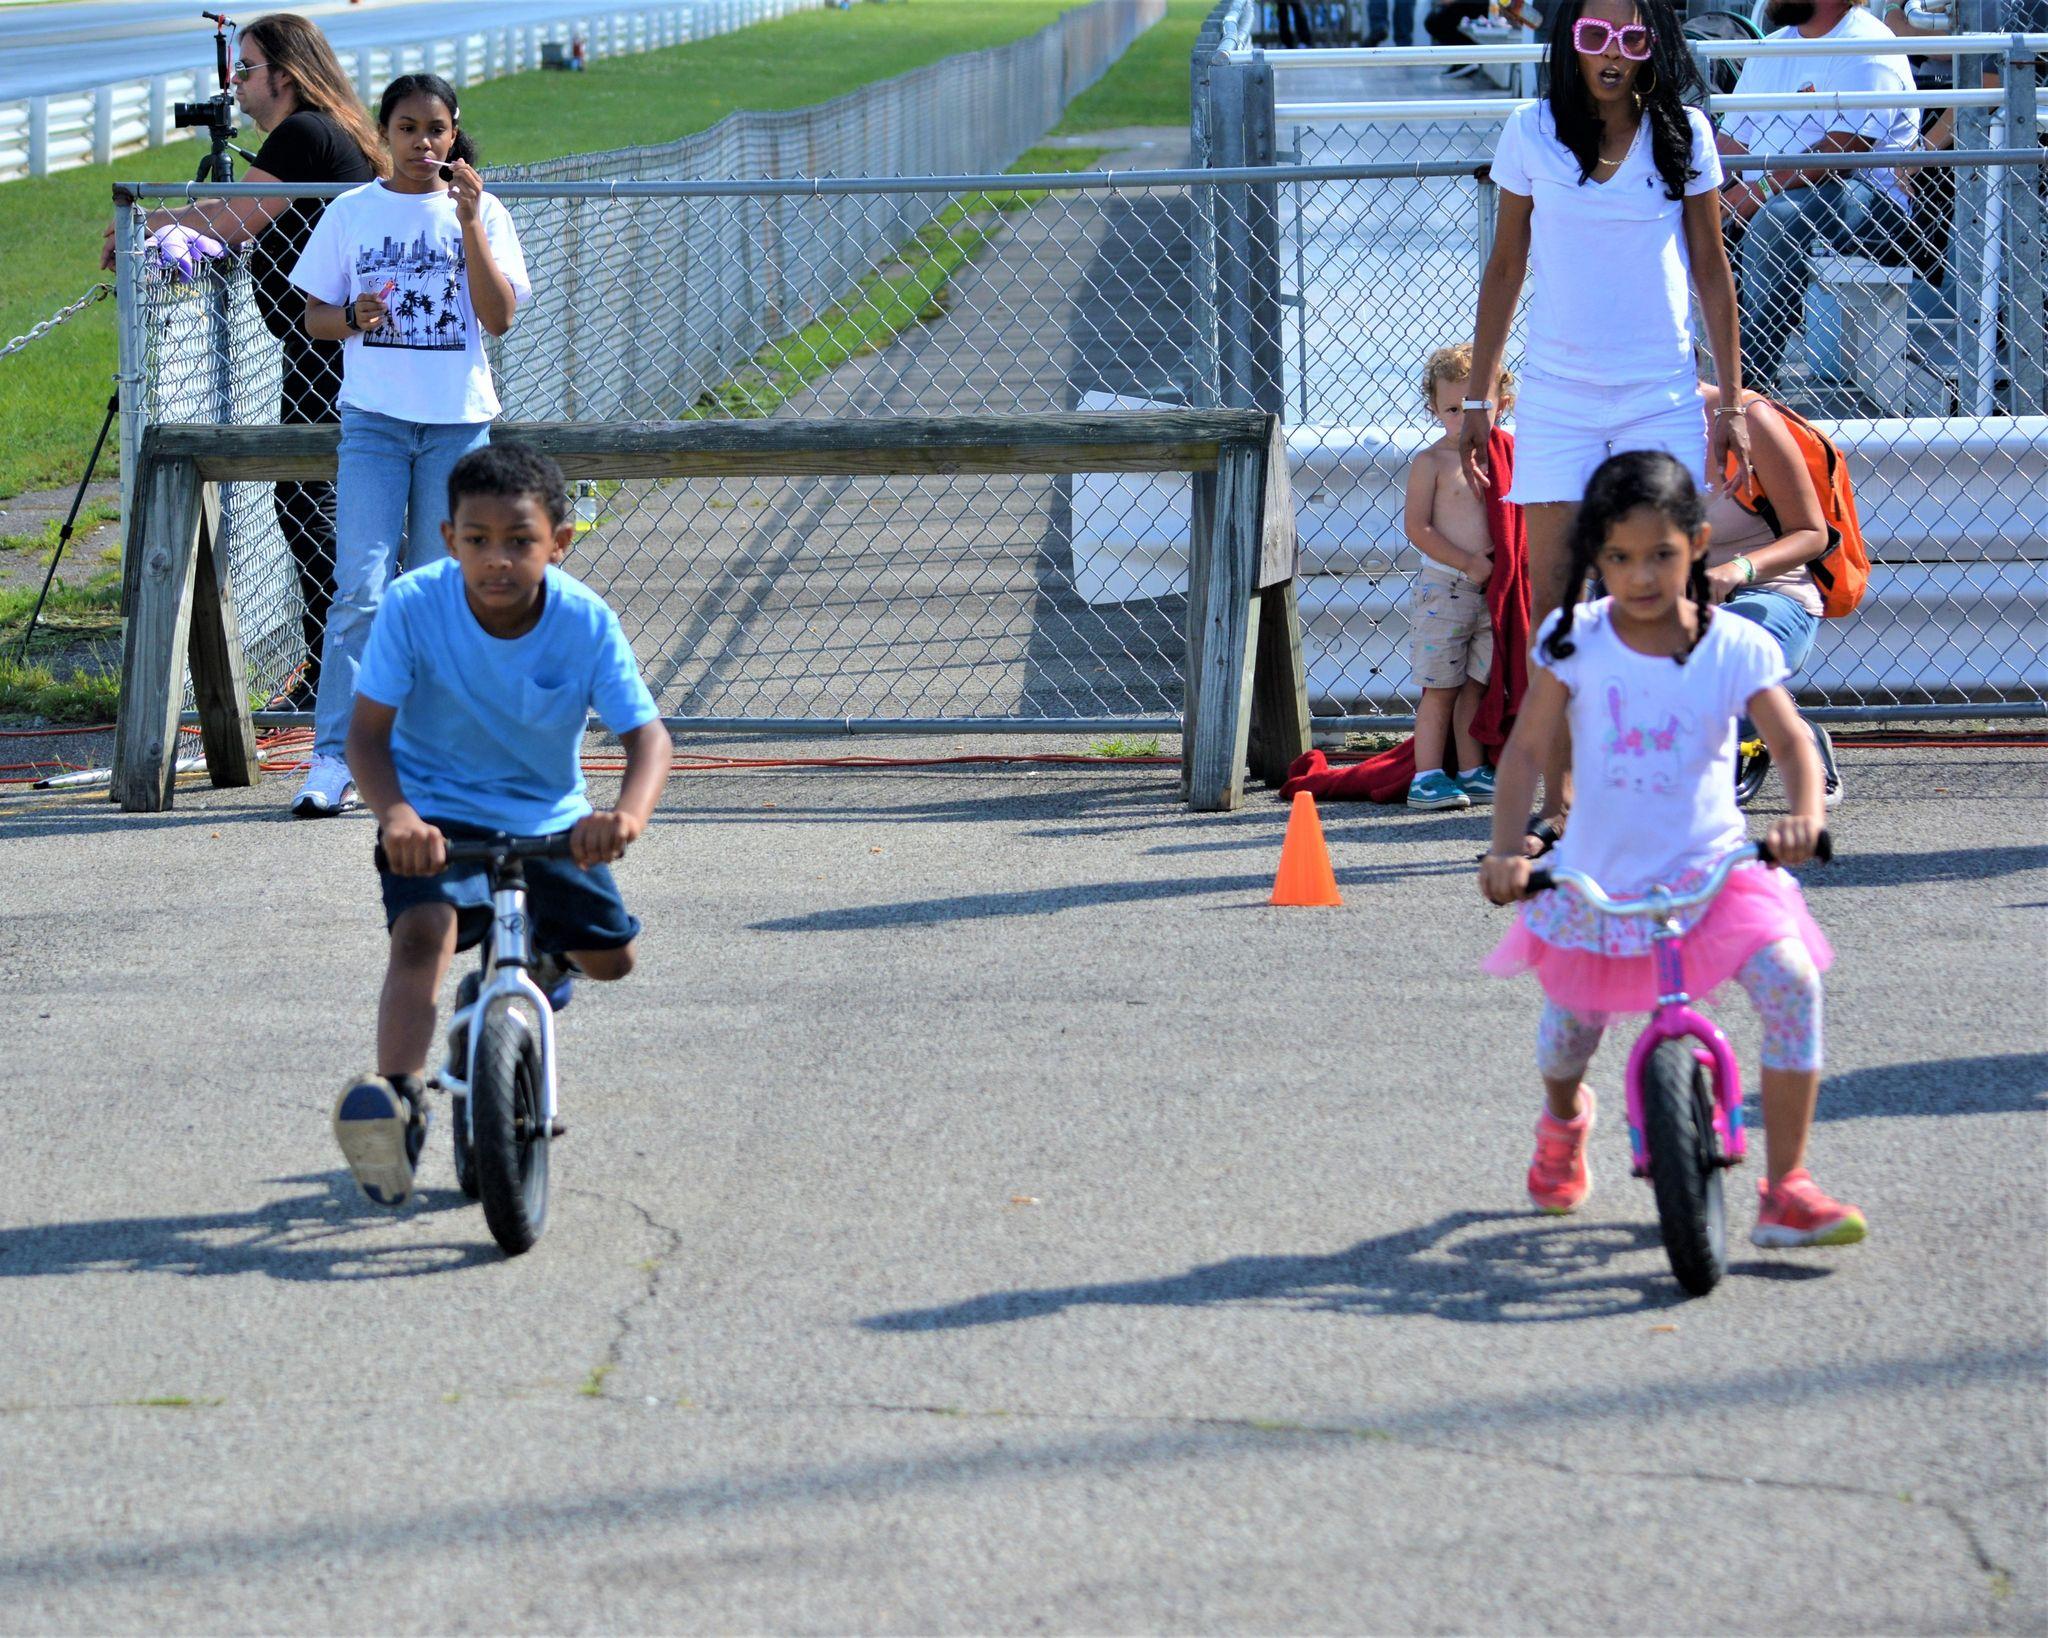 Strider Bike Drag Race